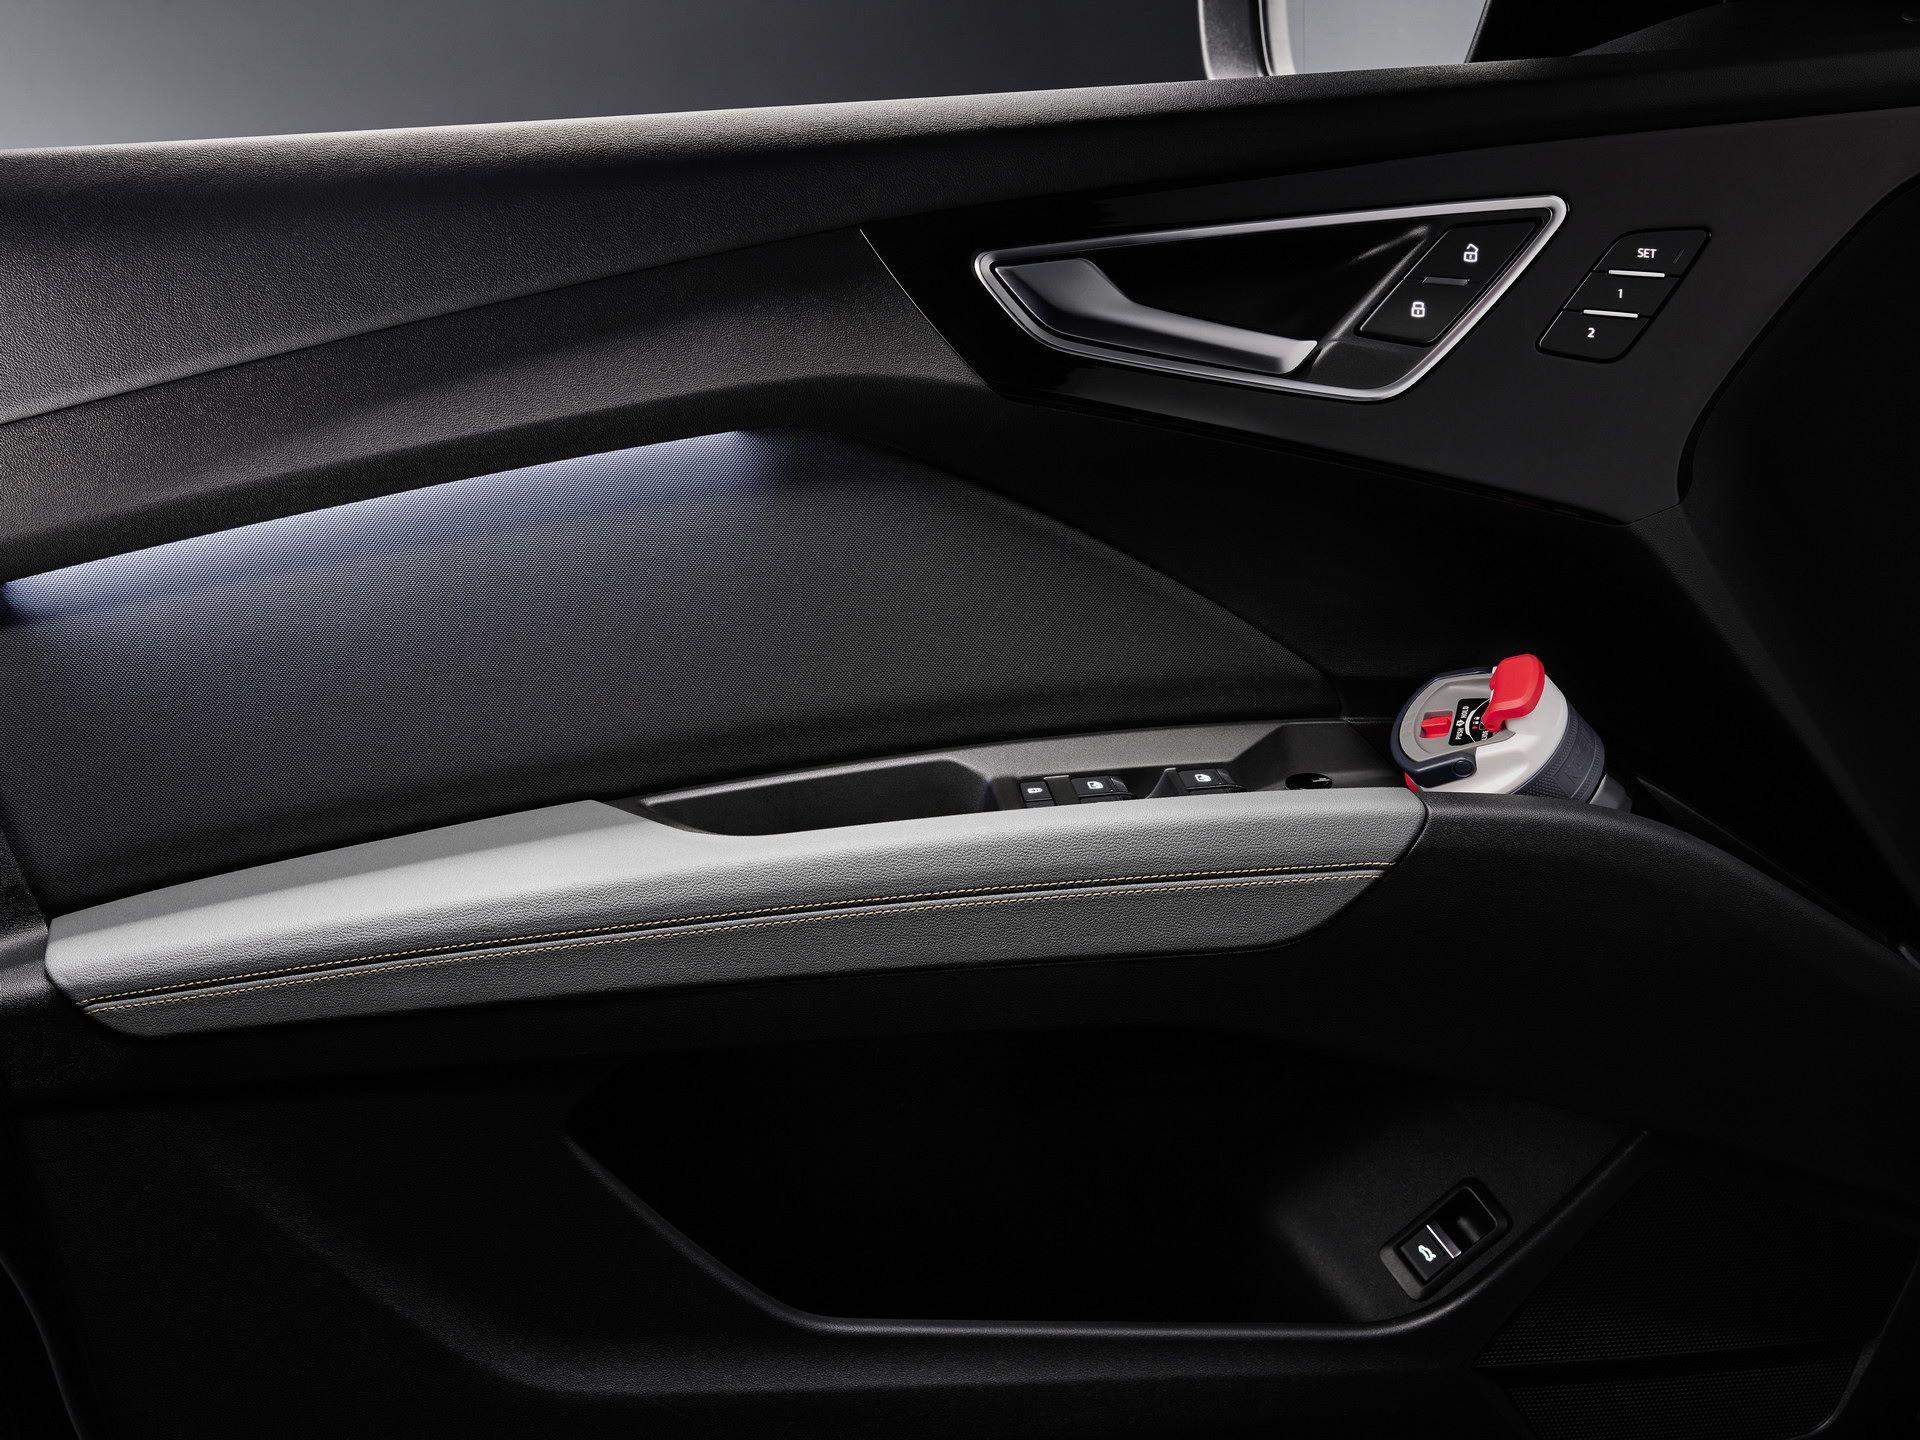 Audi-Q4-e-tron-and-Q4-e-tron-Sportback-84